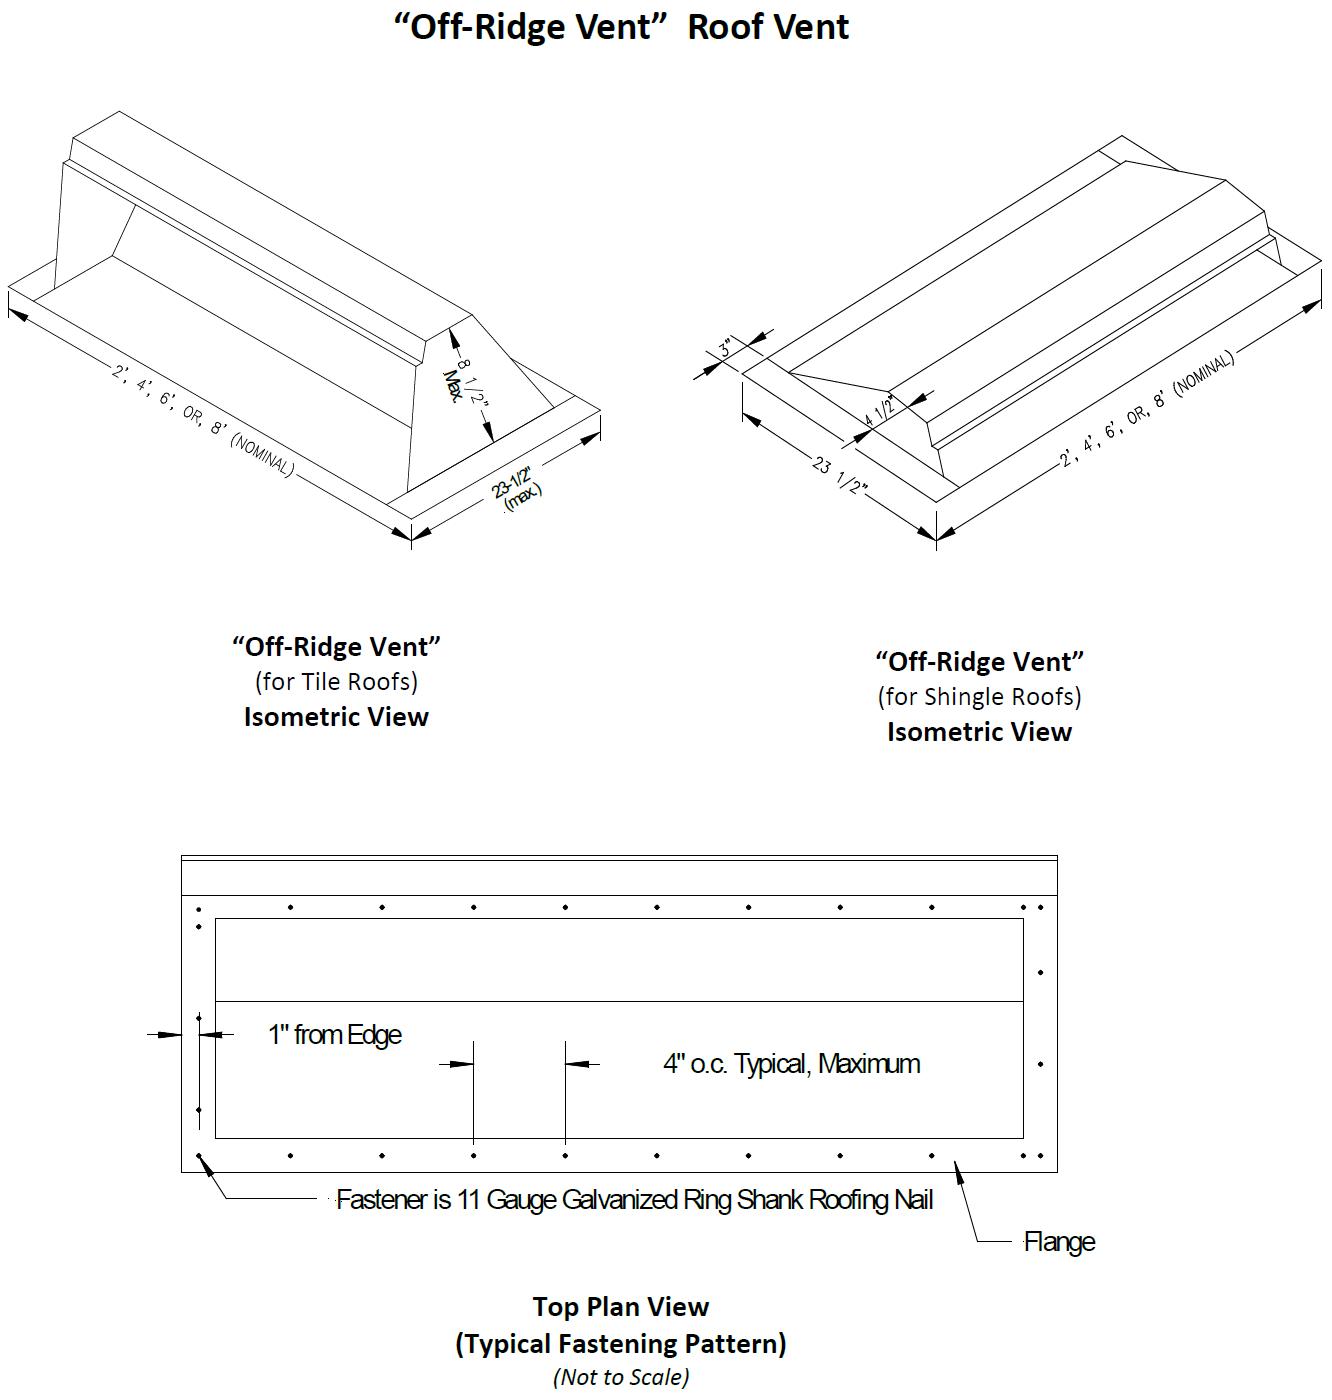 hight resolution of ridge vents diagram photo shingle vents photo slant vents photo soffit vents diagram photo tile roof vents under eave vents diagram photo